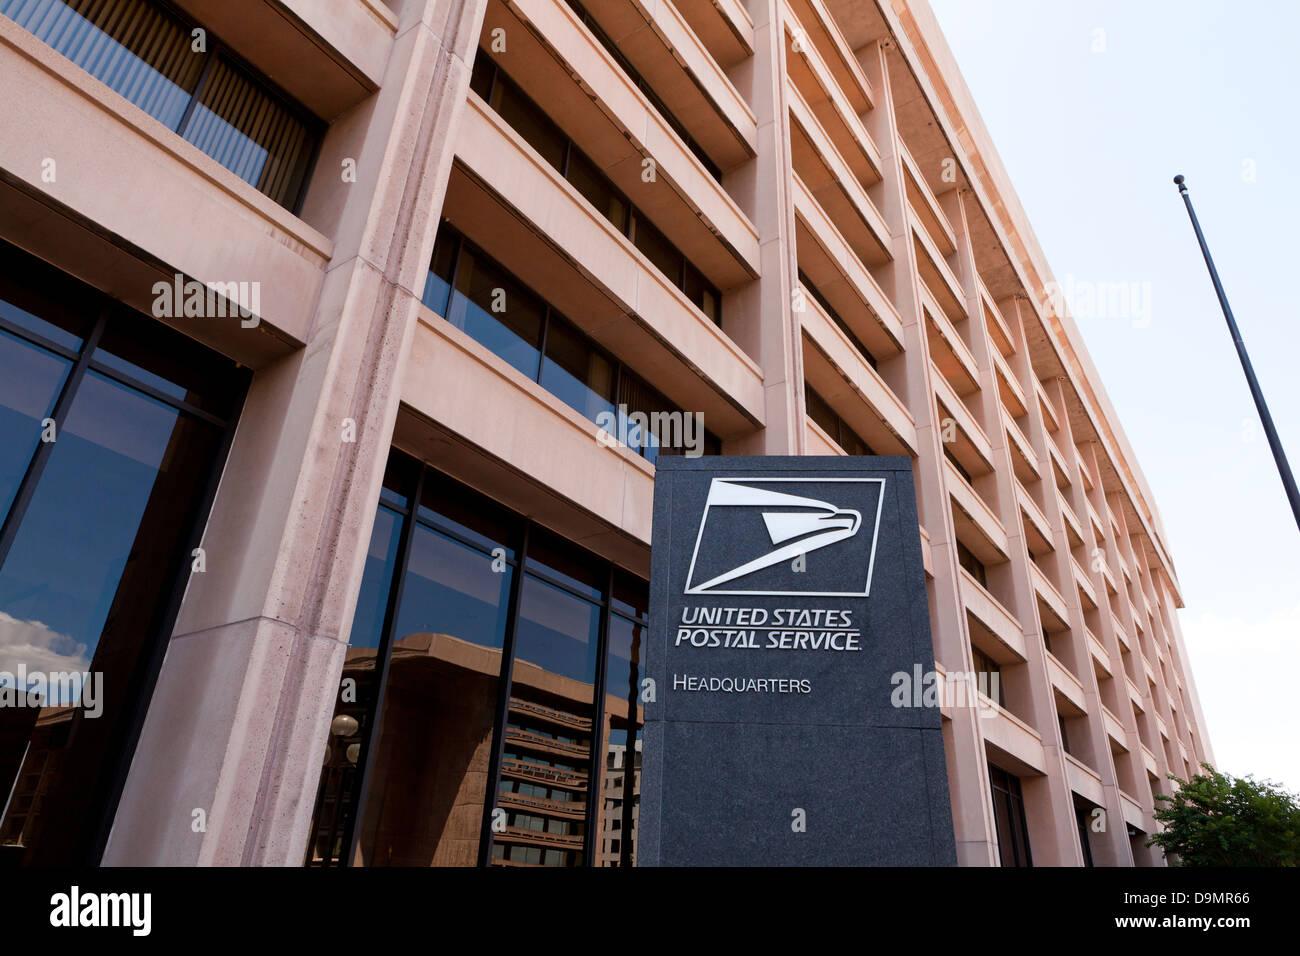 The US Postal Service headquarters building - Washington, DC USA - Stock Image